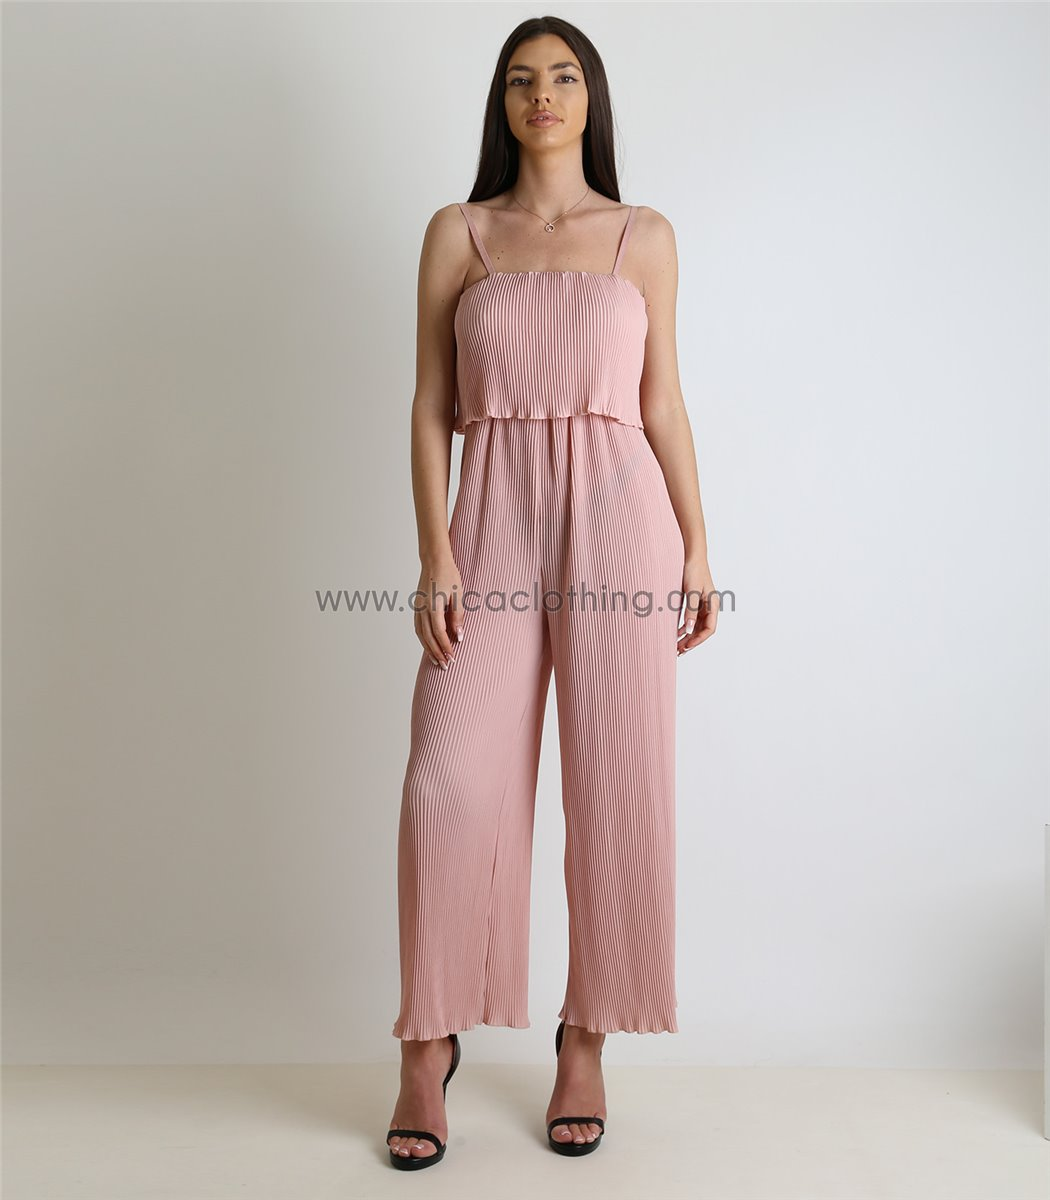 dccc28904870 Γυναικεία ολόσωμη φόρμα πλισέ με ρυθμιζόμενες τιράντες (Ροζ)